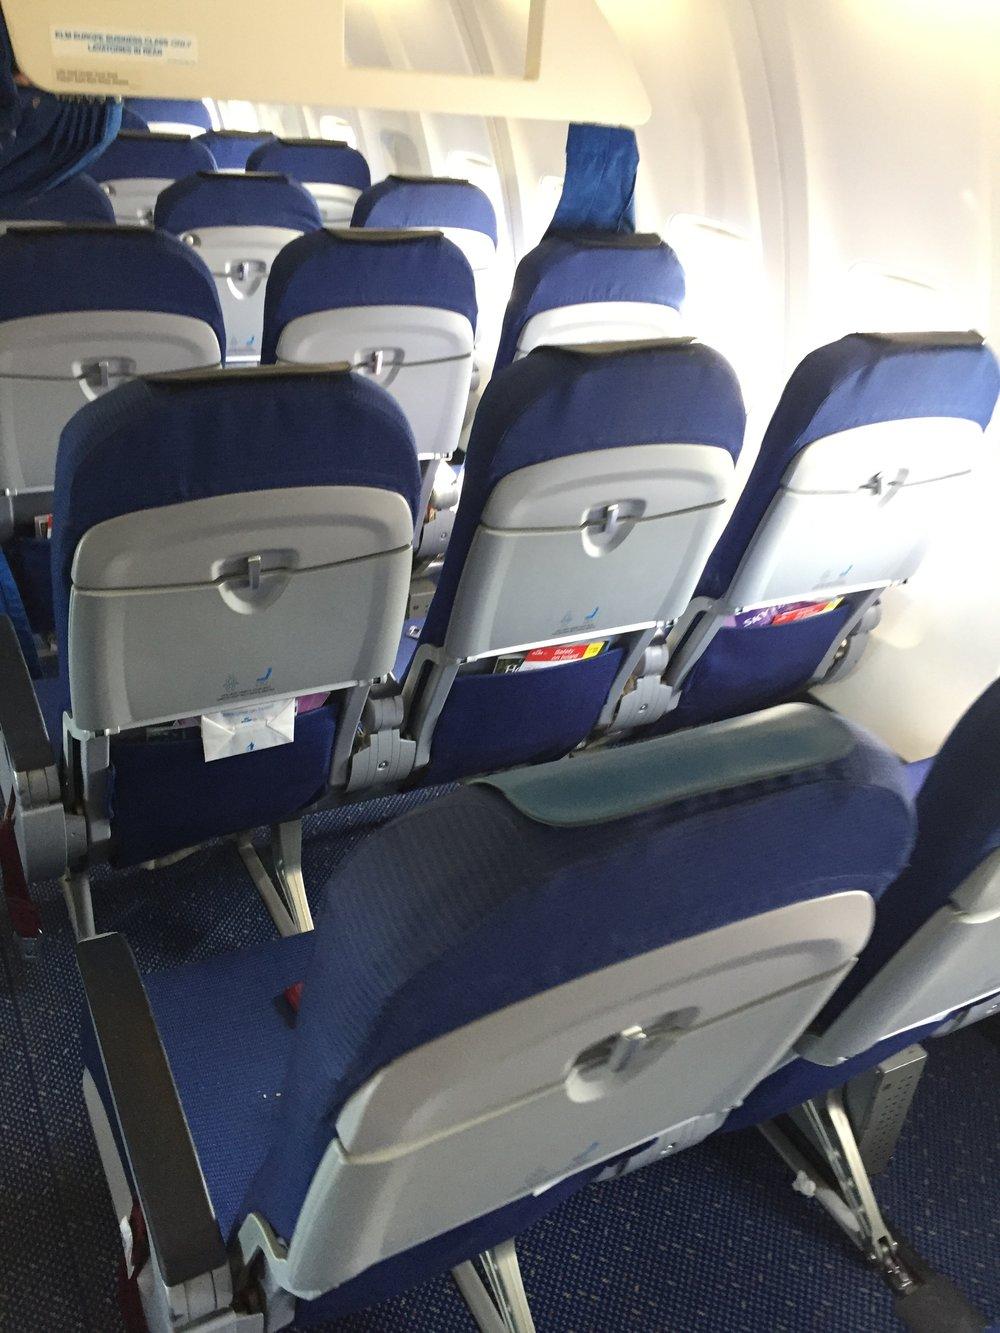 klm economy class seats.JPG